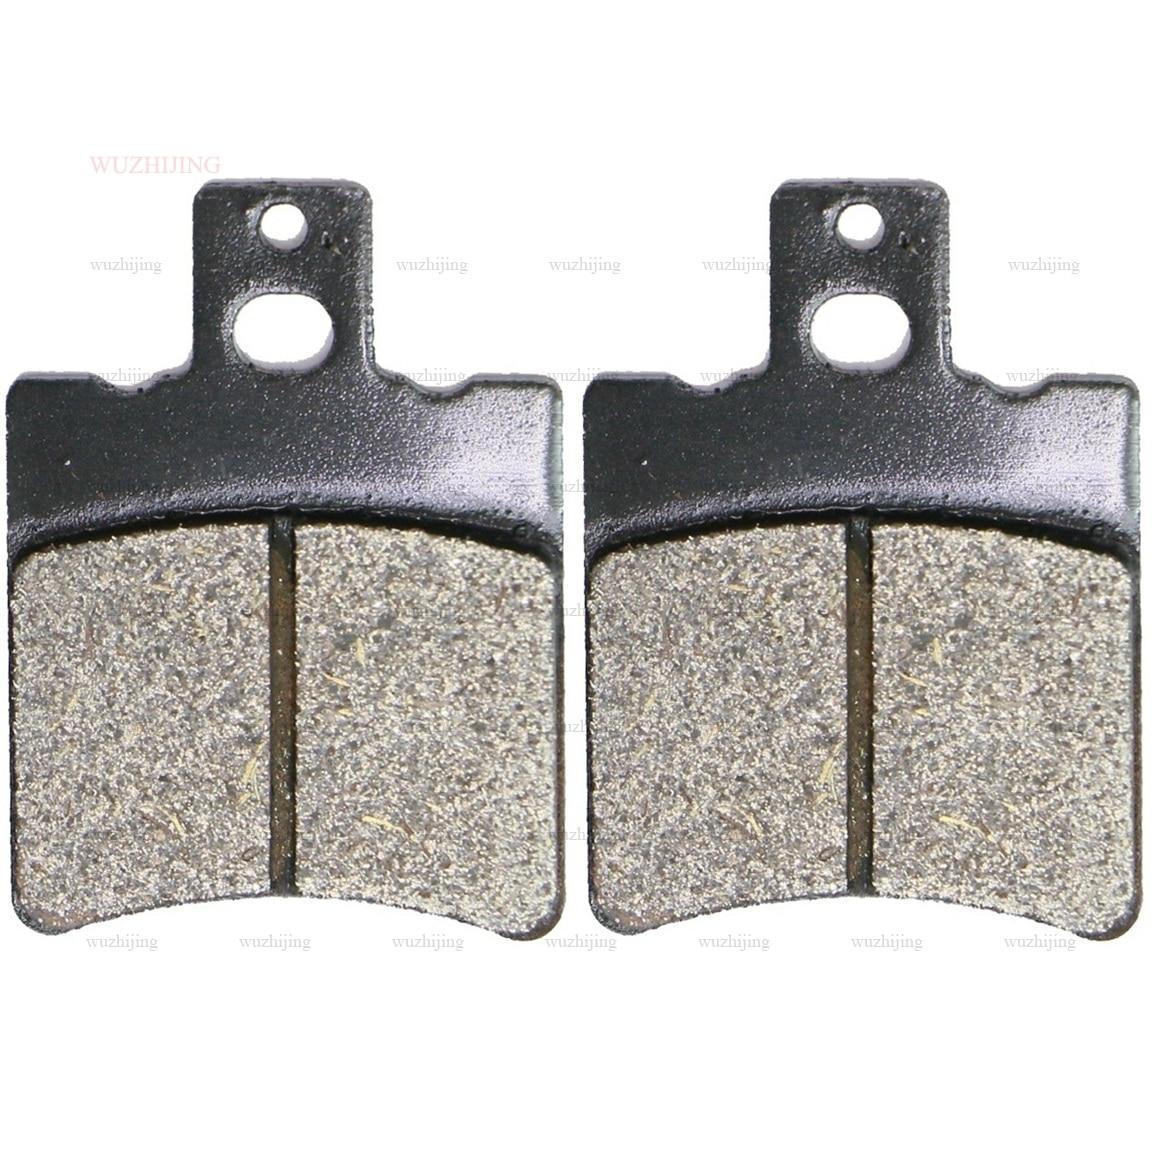 Brake Pad fit CAGIVA Elefant 750 (84-86) 650 (85) LR S ST SXT 80 (83) Mito 50 (99) MXR 250 400 500 (82) S ST 250 350 AV (81-89)